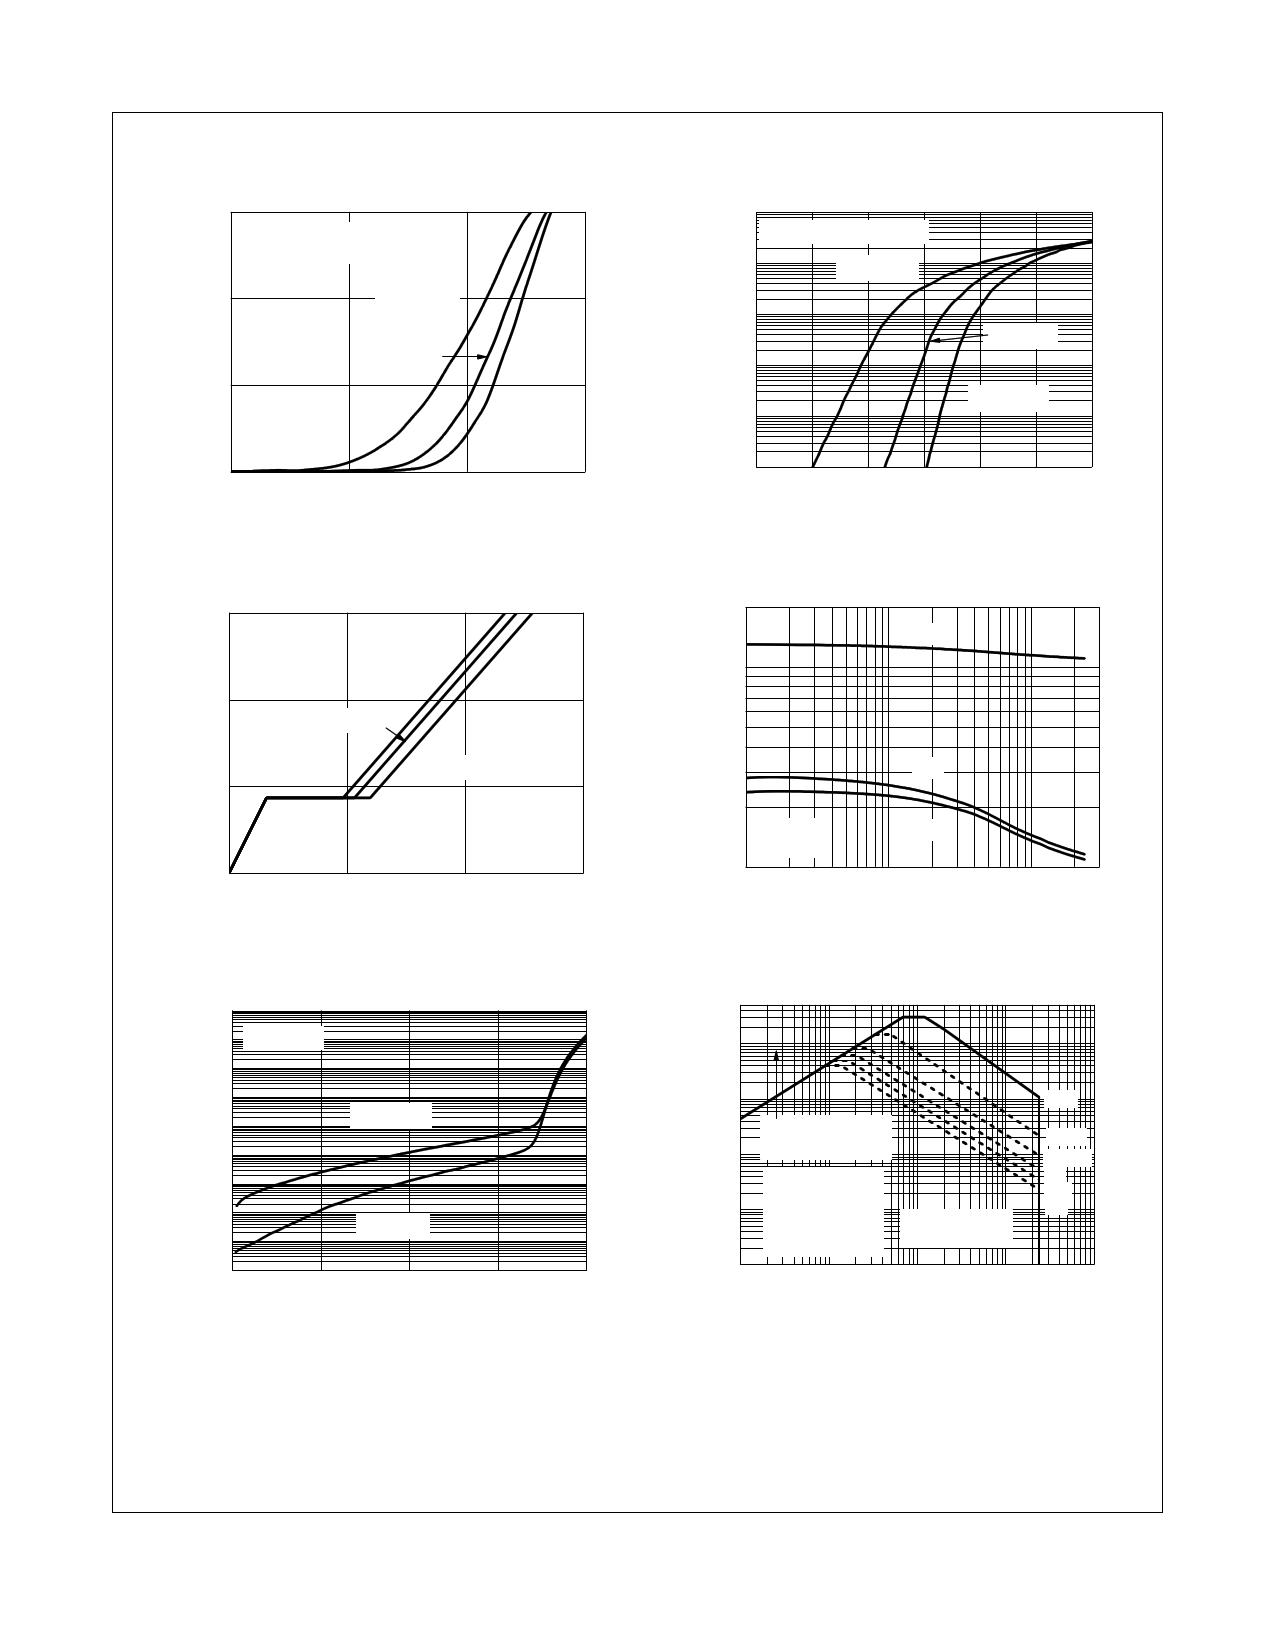 FDZ1416NZ pdf, 반도체, 판매, 대치품